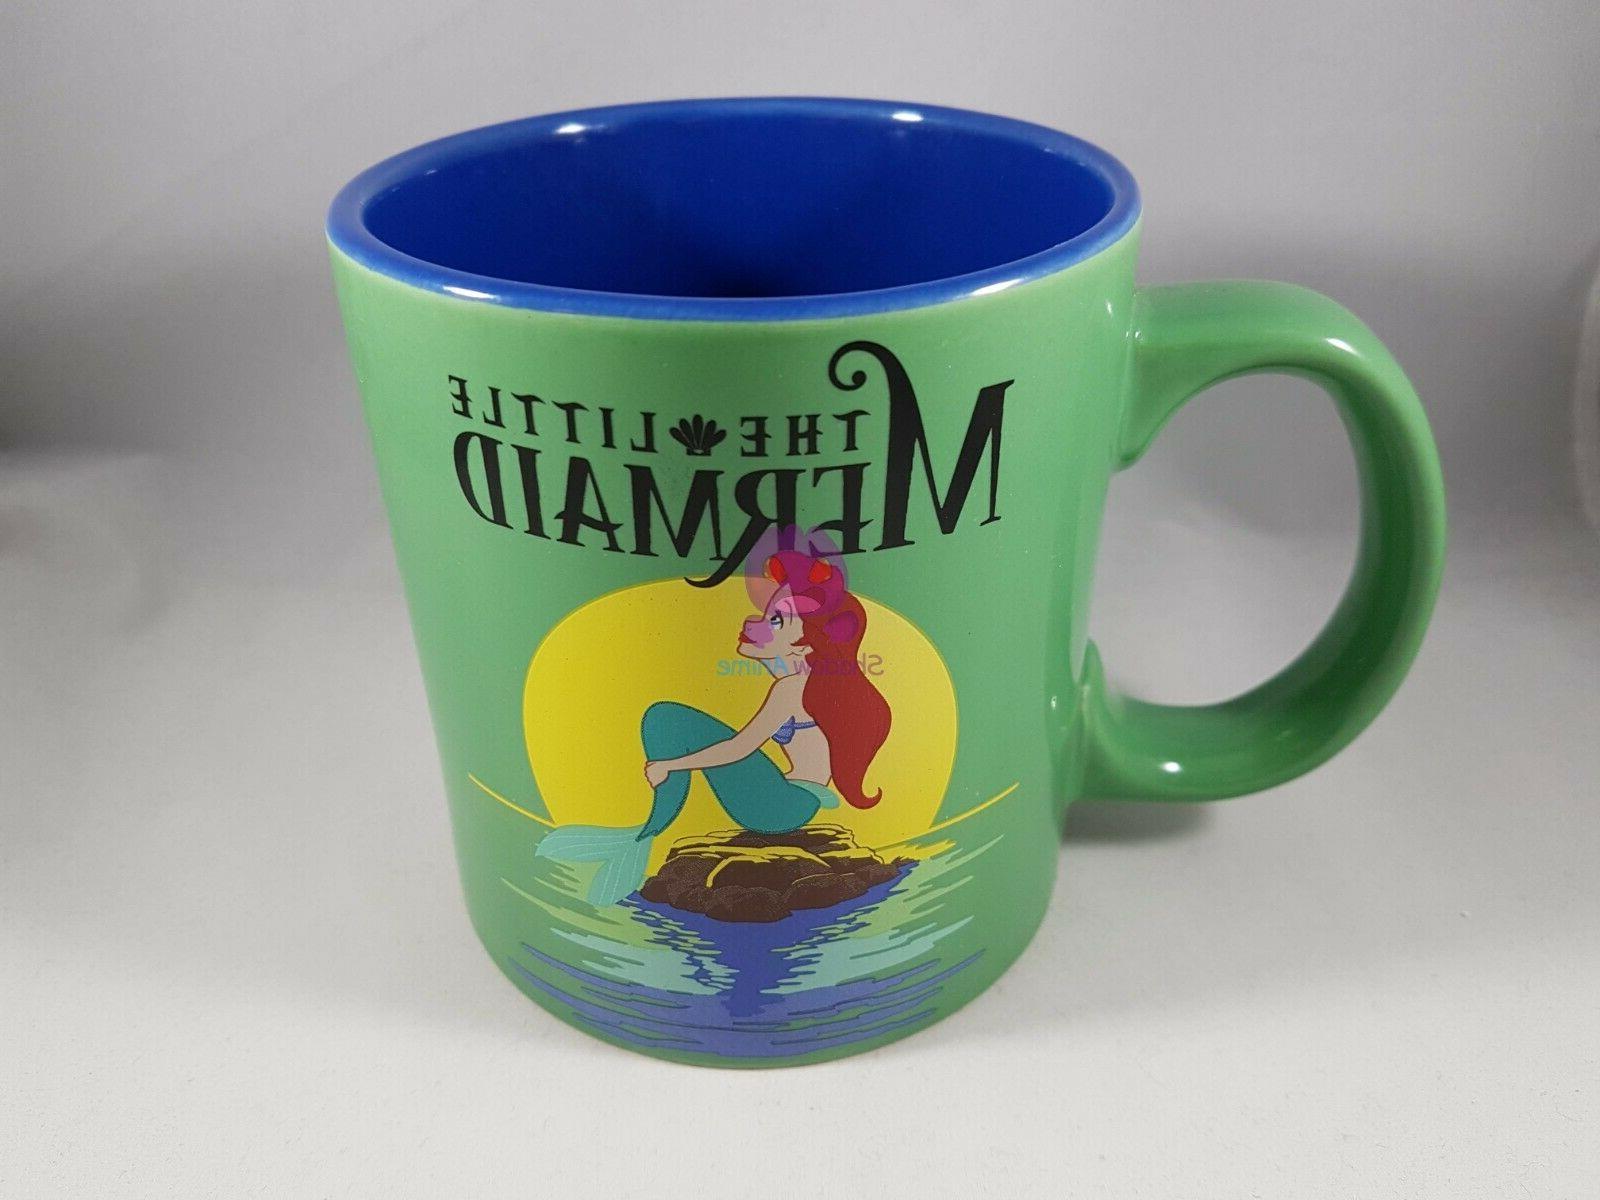 the little mermaid mug 20oz green blue